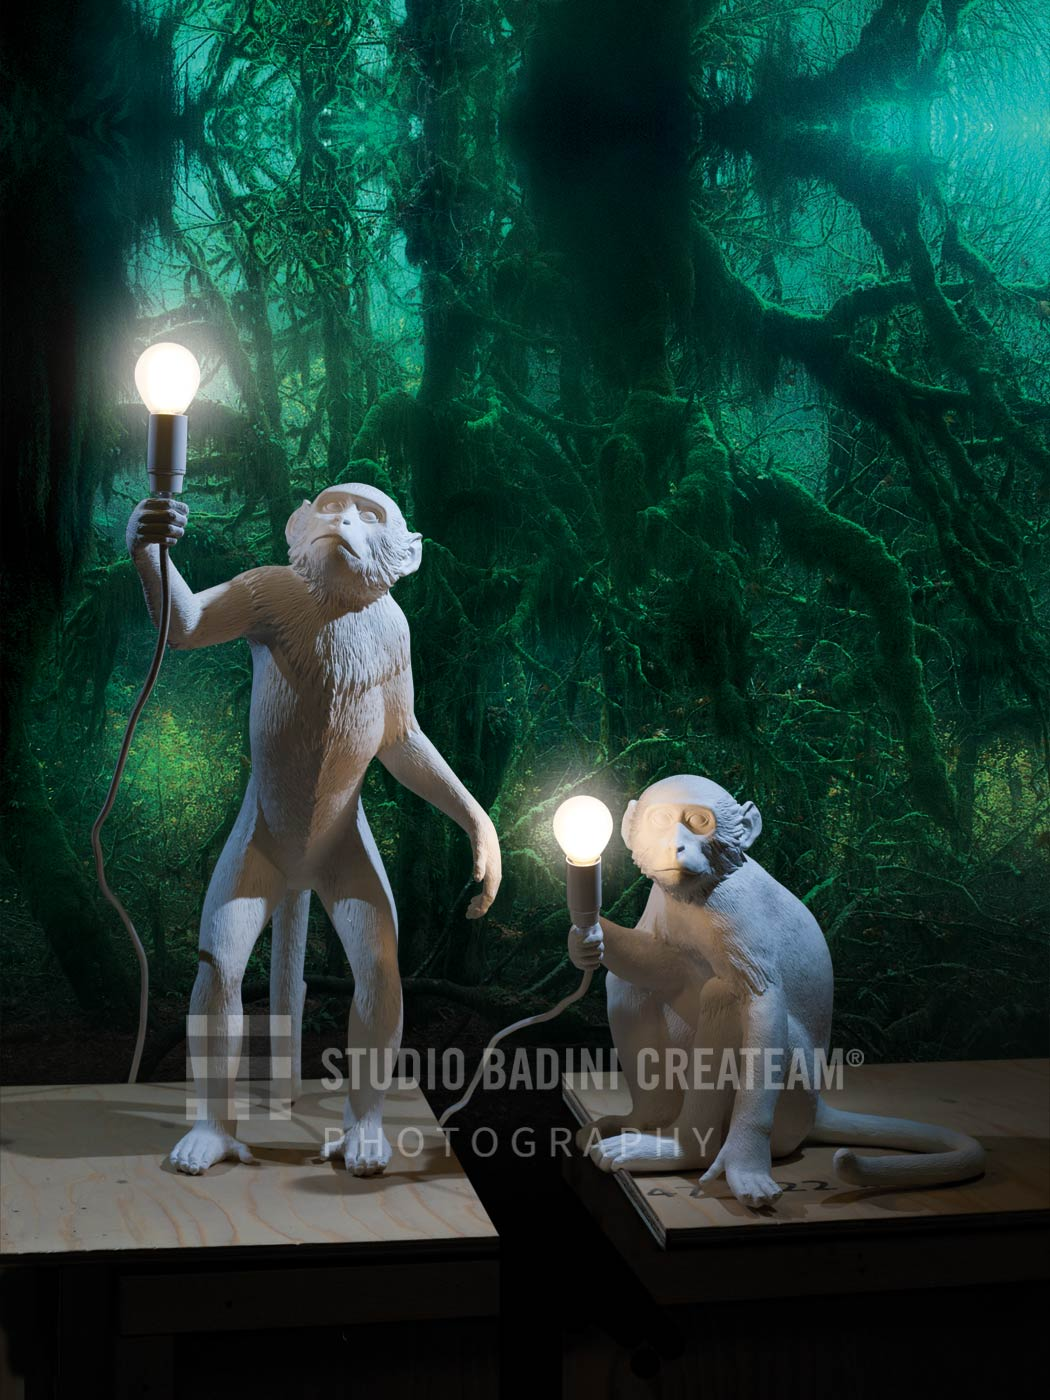 Badini Creative Studio - fotografia - seletti - monkey-lamp